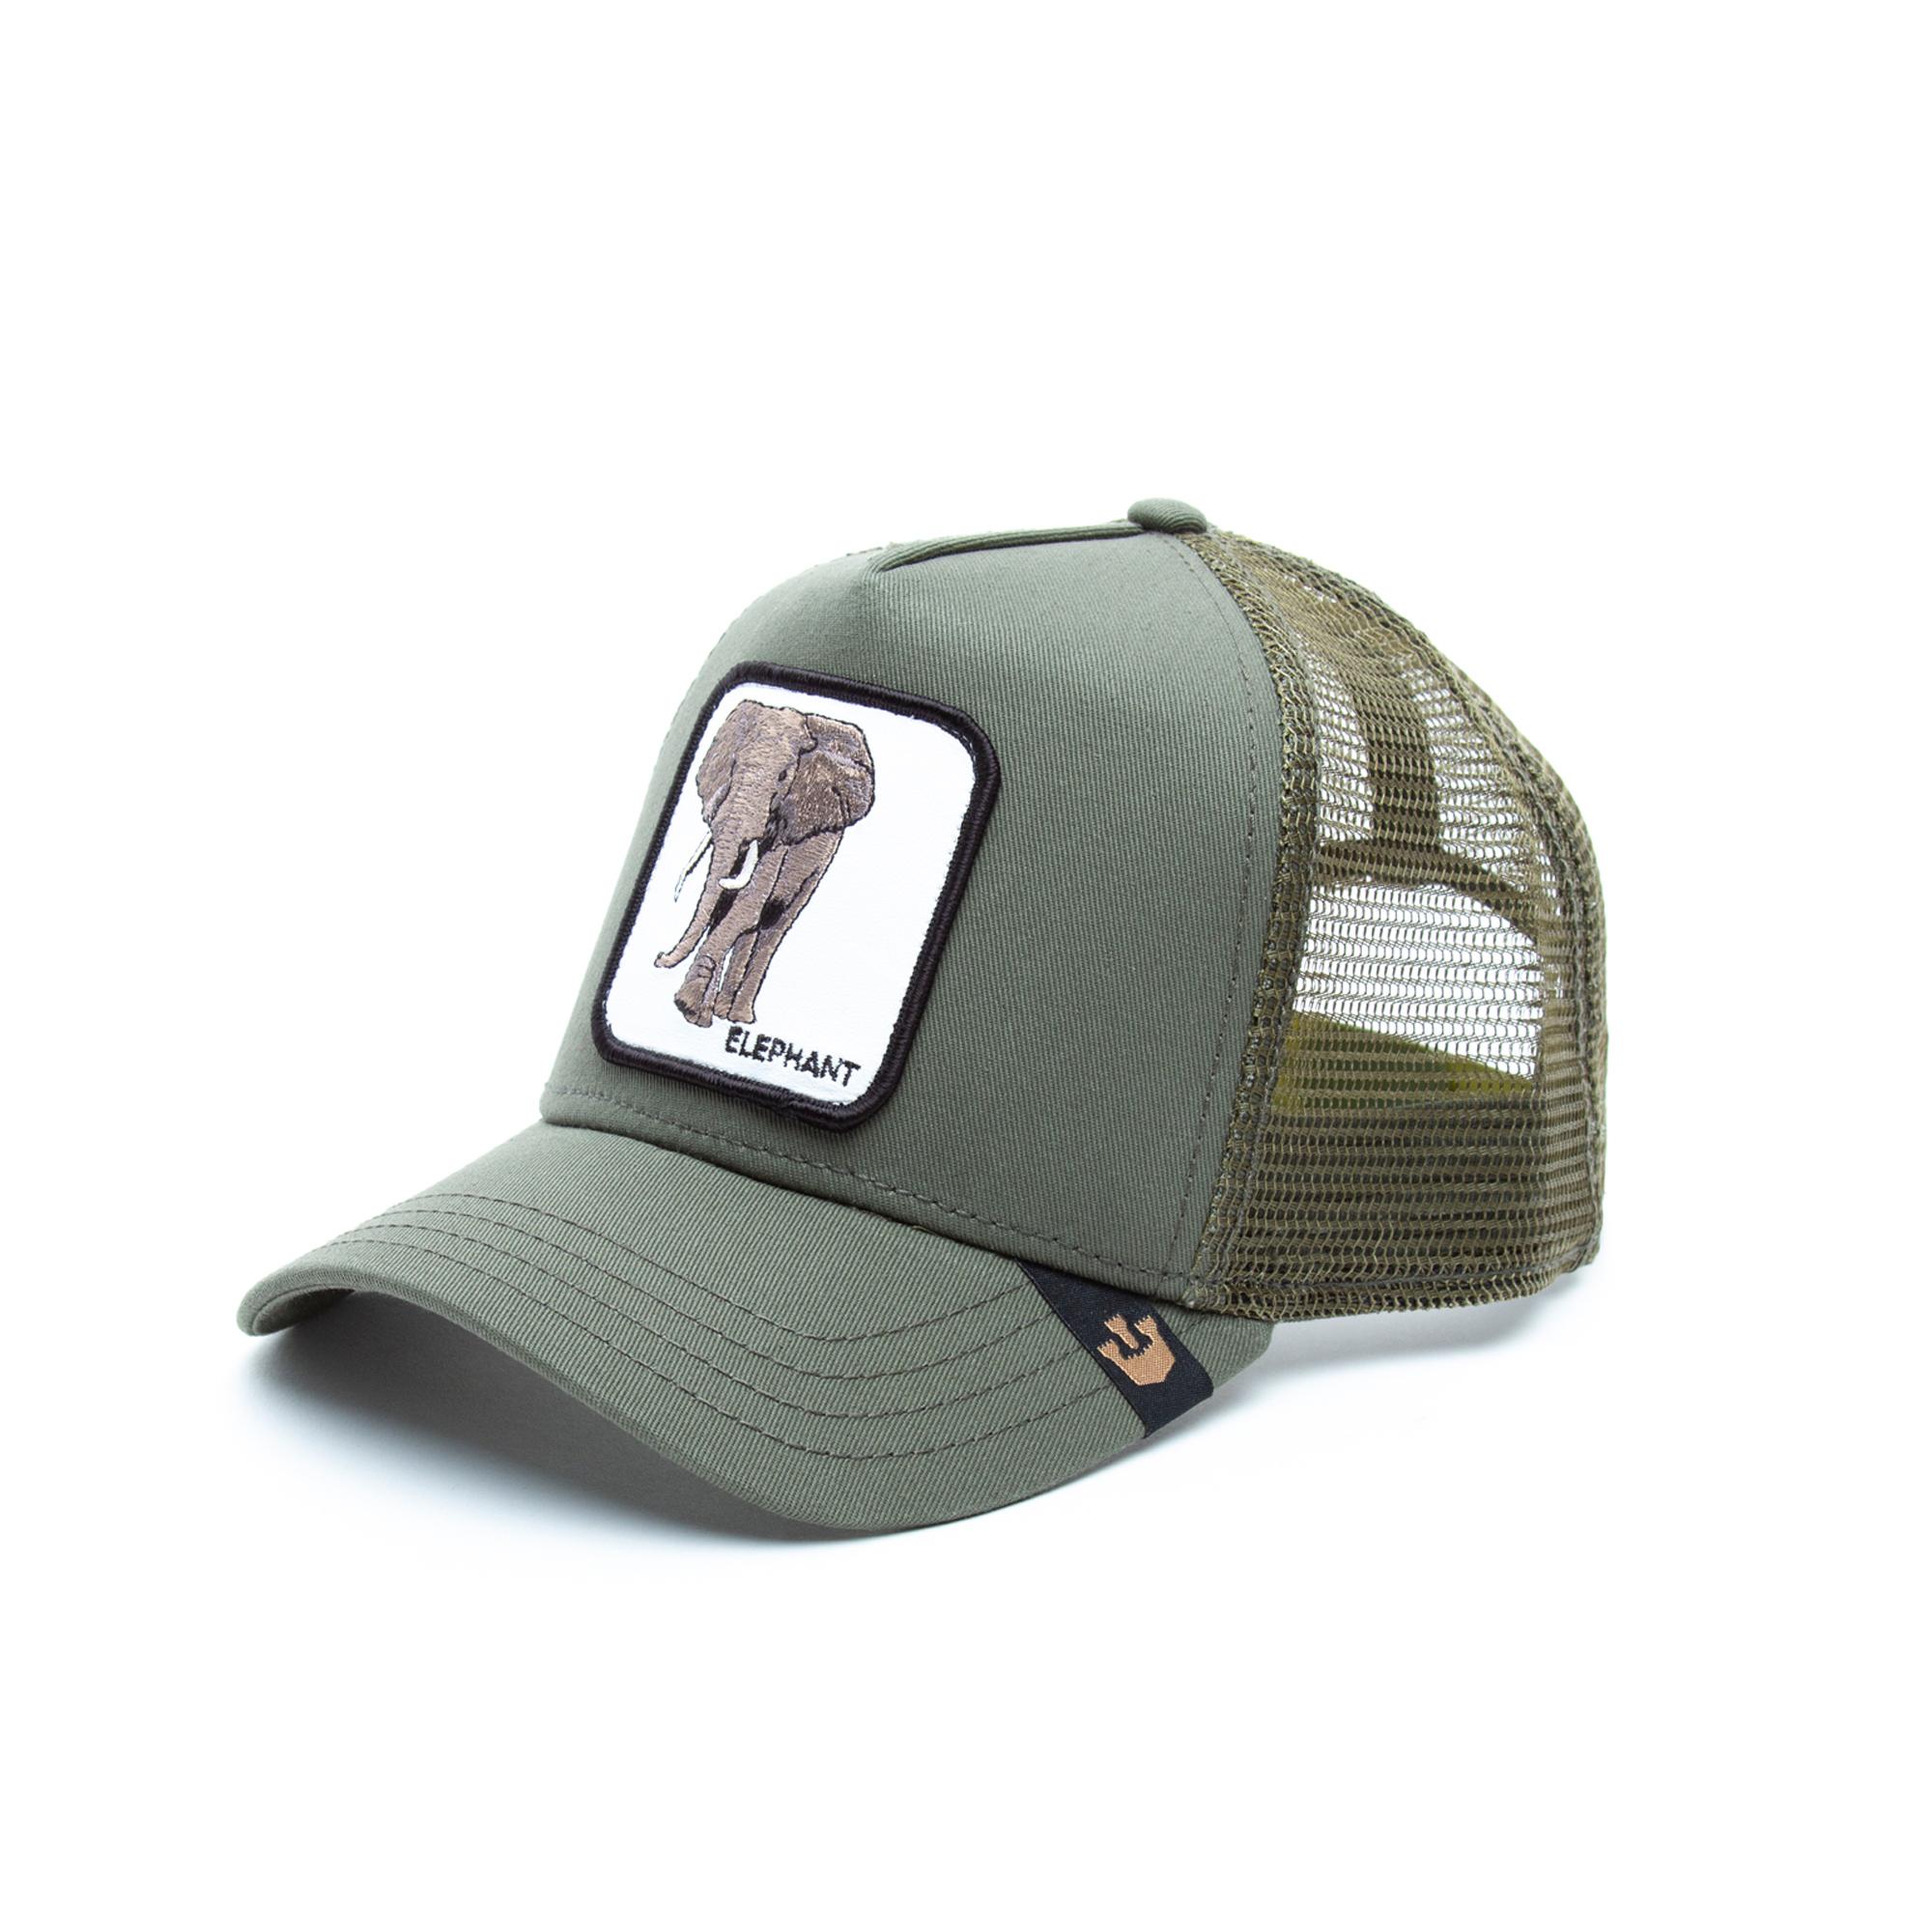 Goorin Bros Elephant Yeşil Şapka